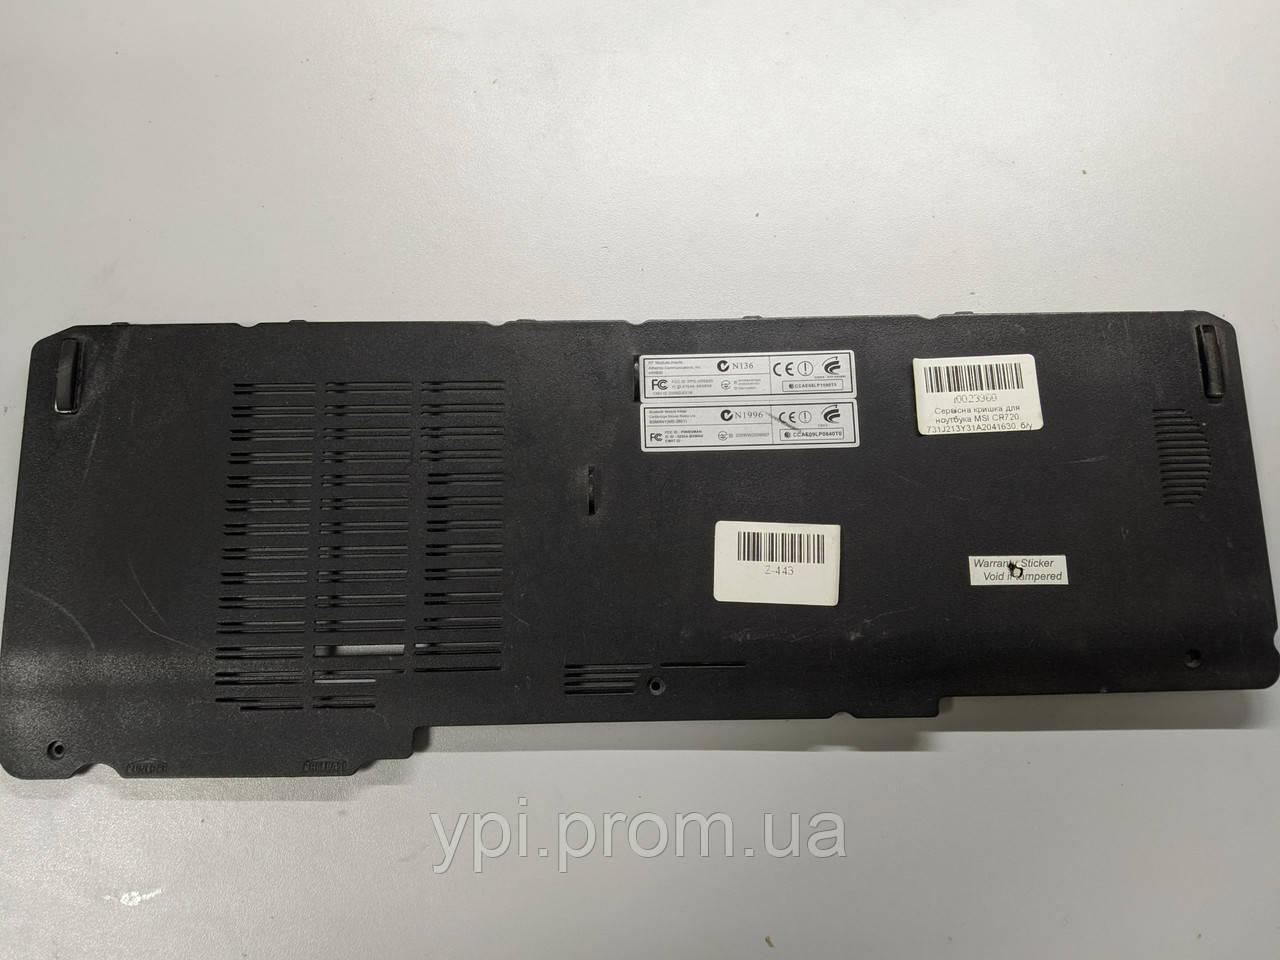 Сервисная крышка для ноутбука MSI CR720, 731J213Y31A2041630